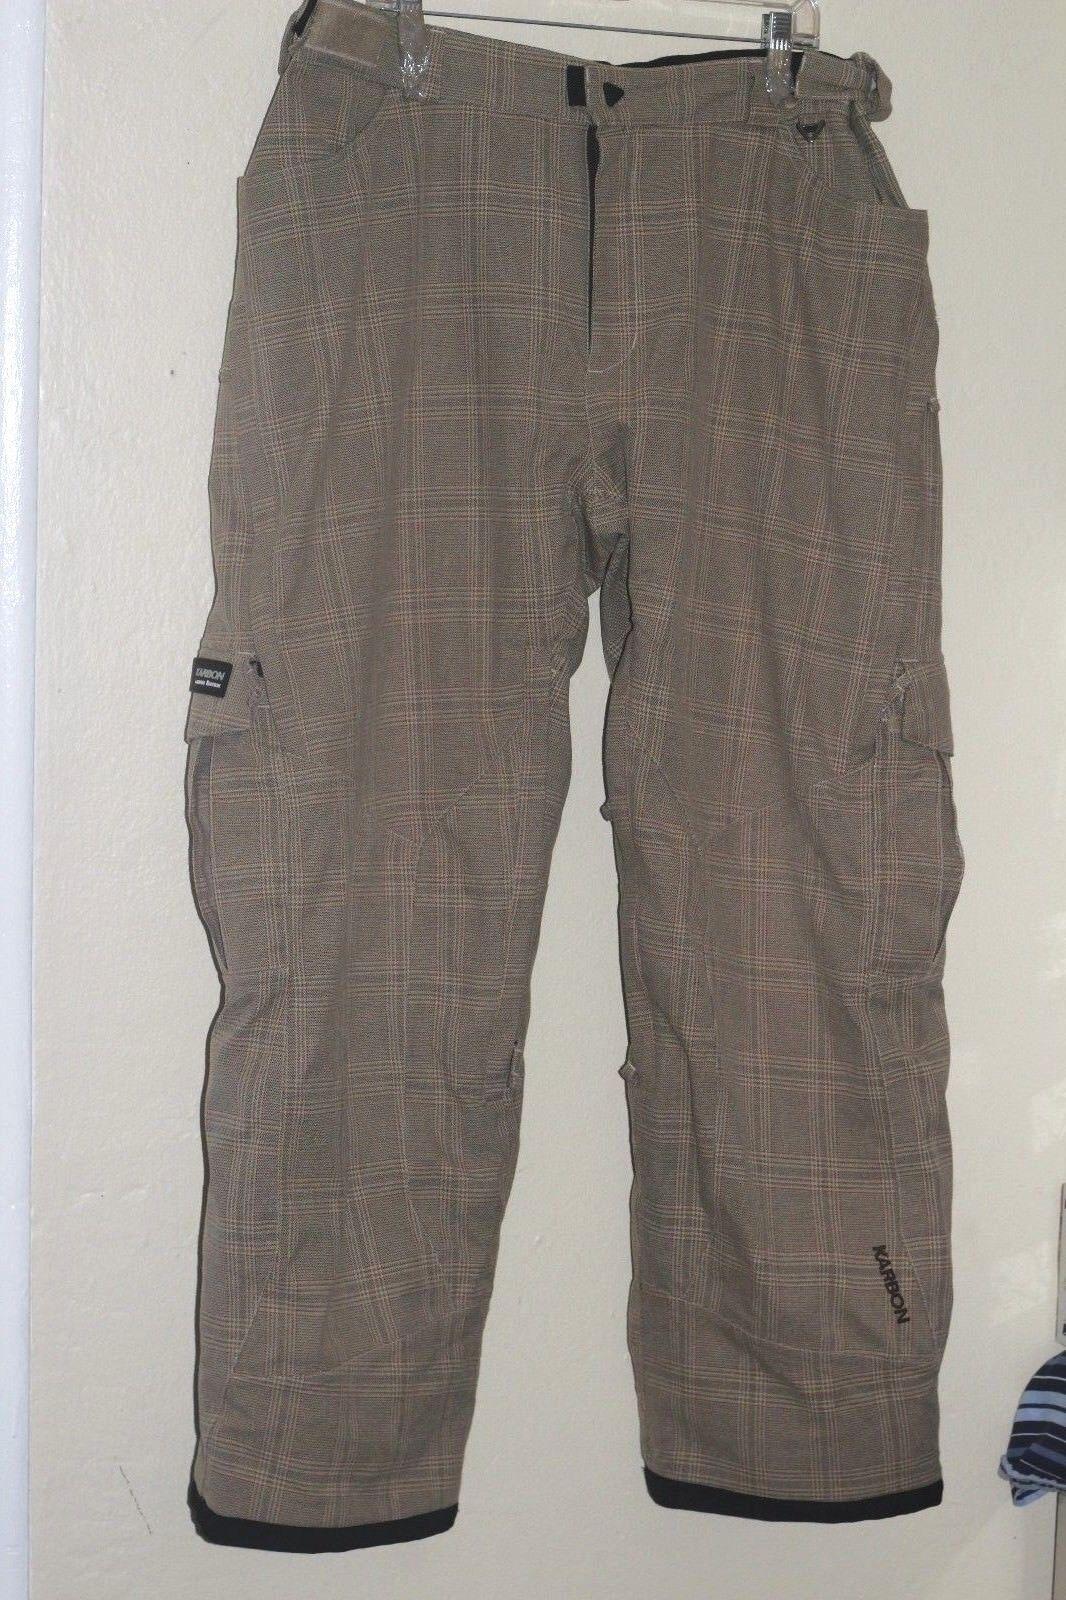 Karbon Snow Ski Pants Plaid Mens XL  Snowboard Limited Edition